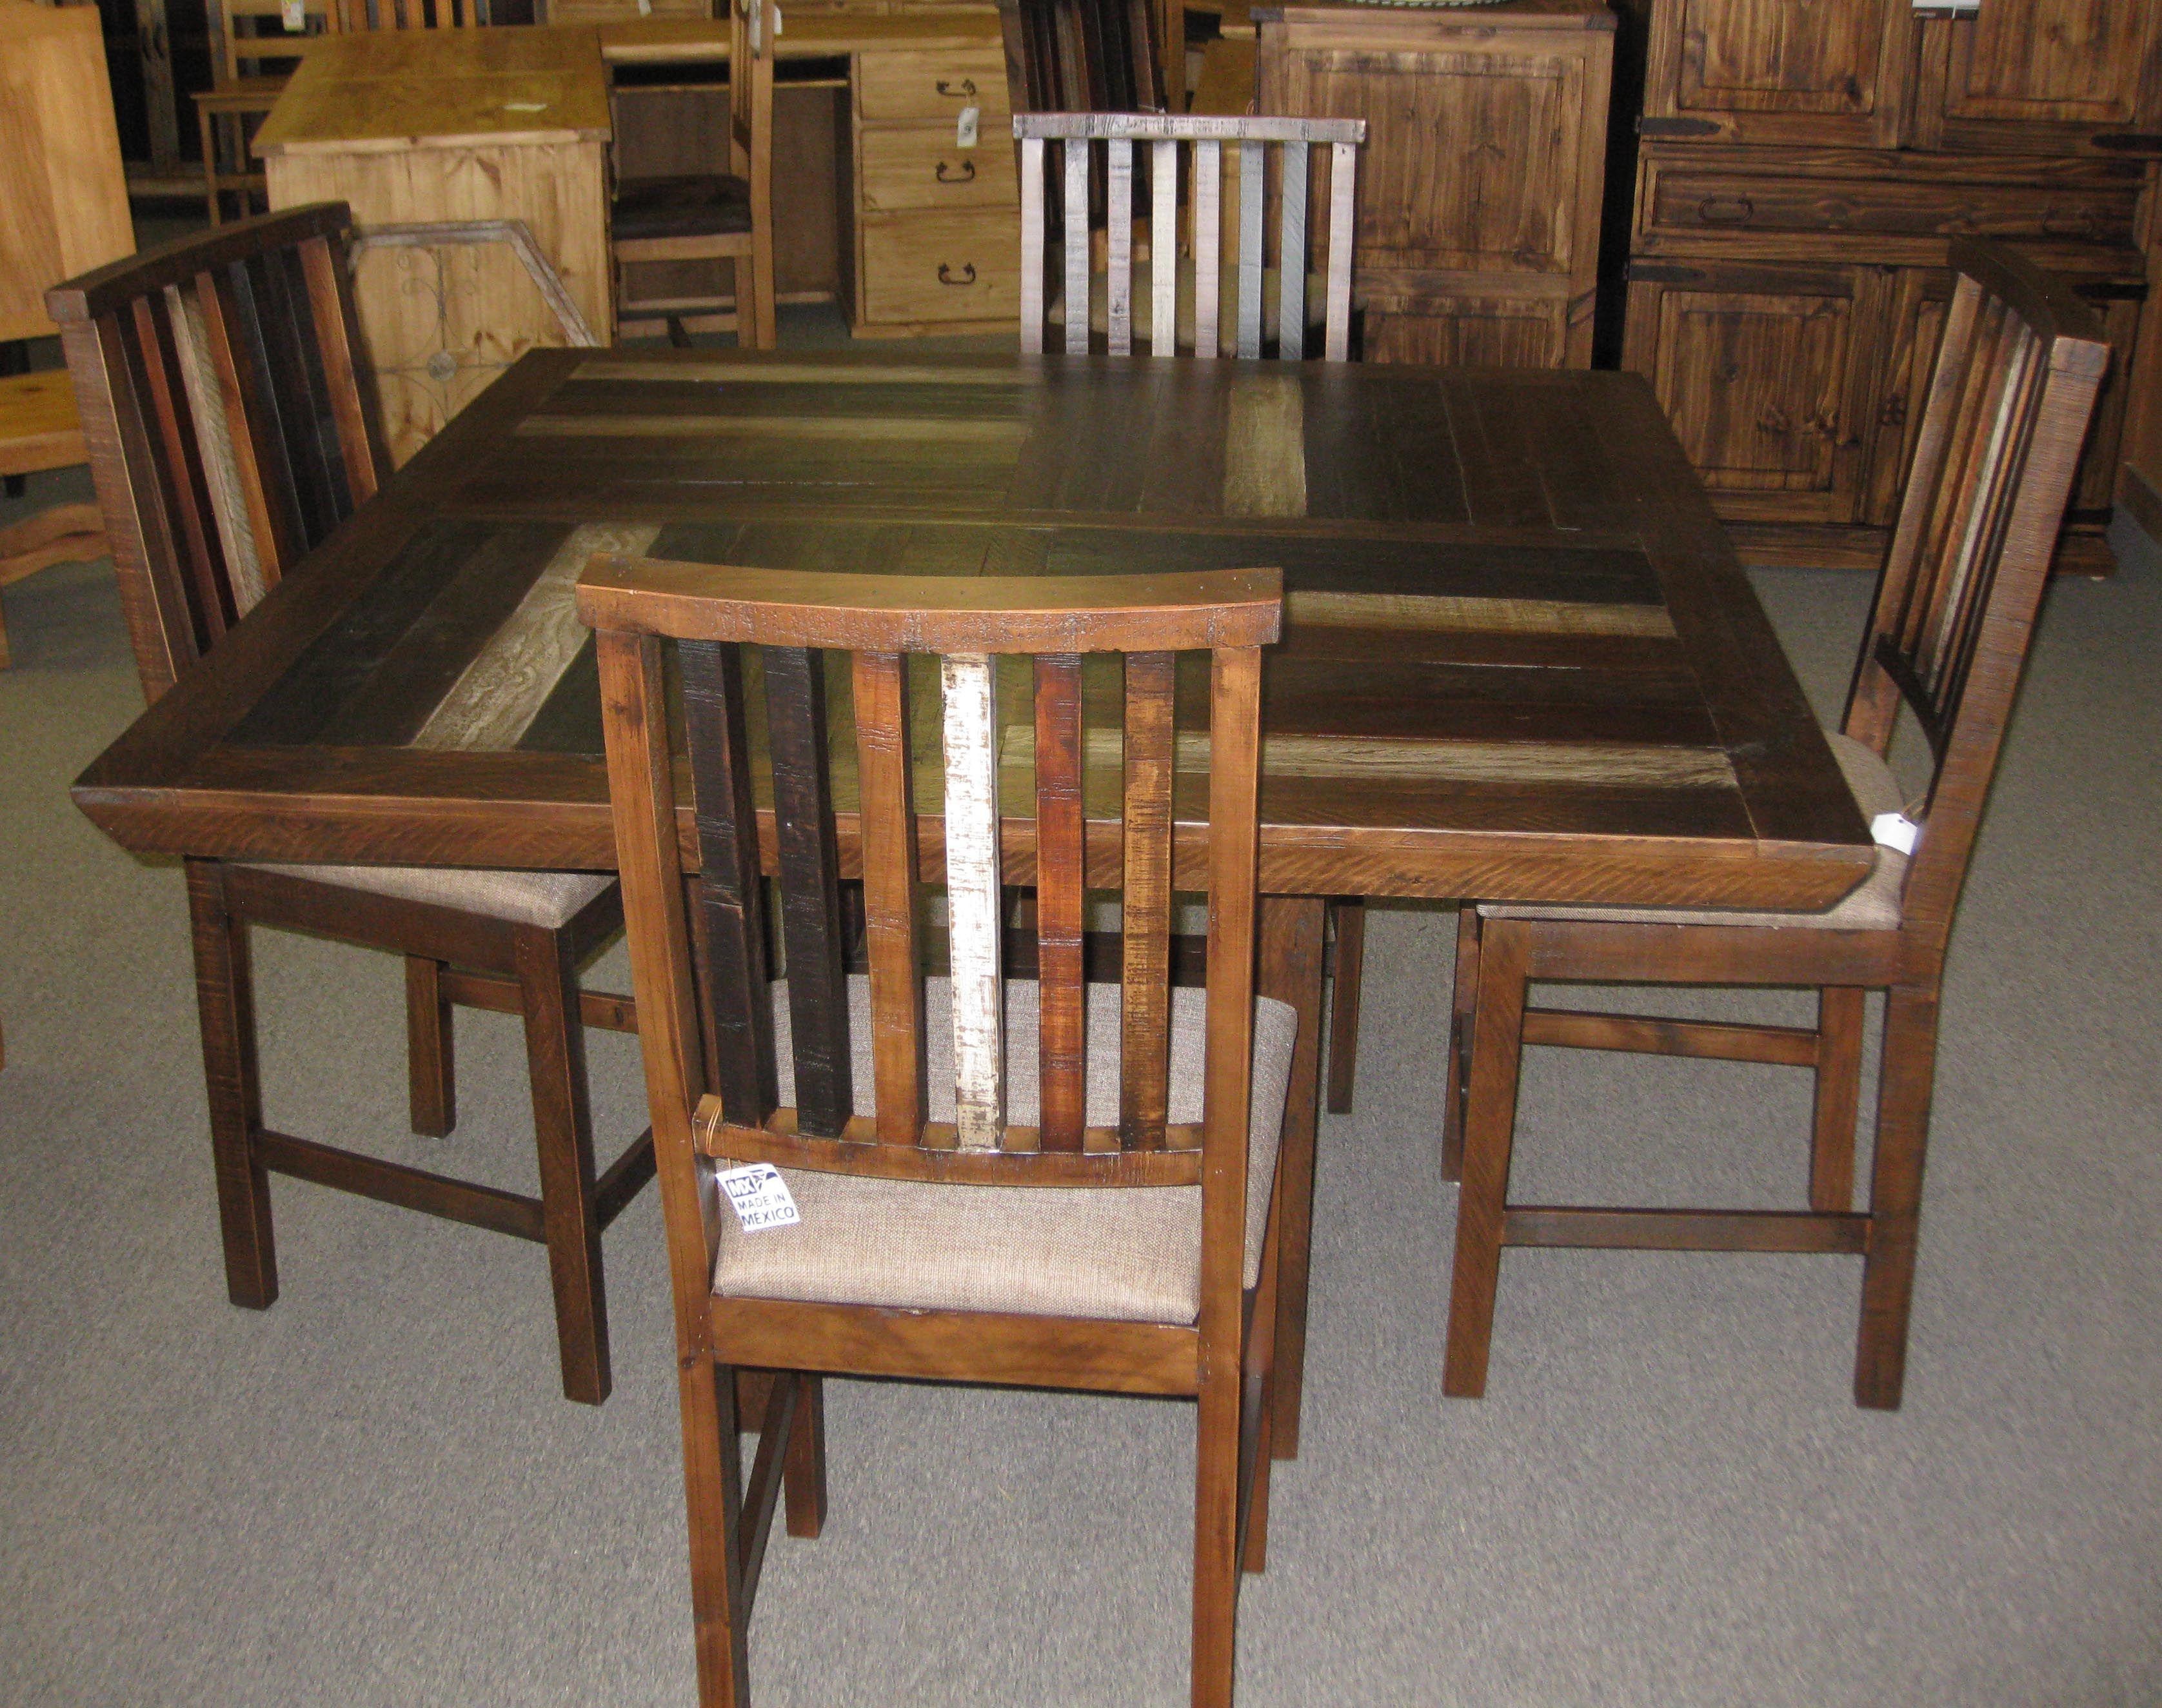 Prime Colorful And Elegant This Beautiful Colorado Style Pub Table Creativecarmelina Interior Chair Design Creativecarmelinacom